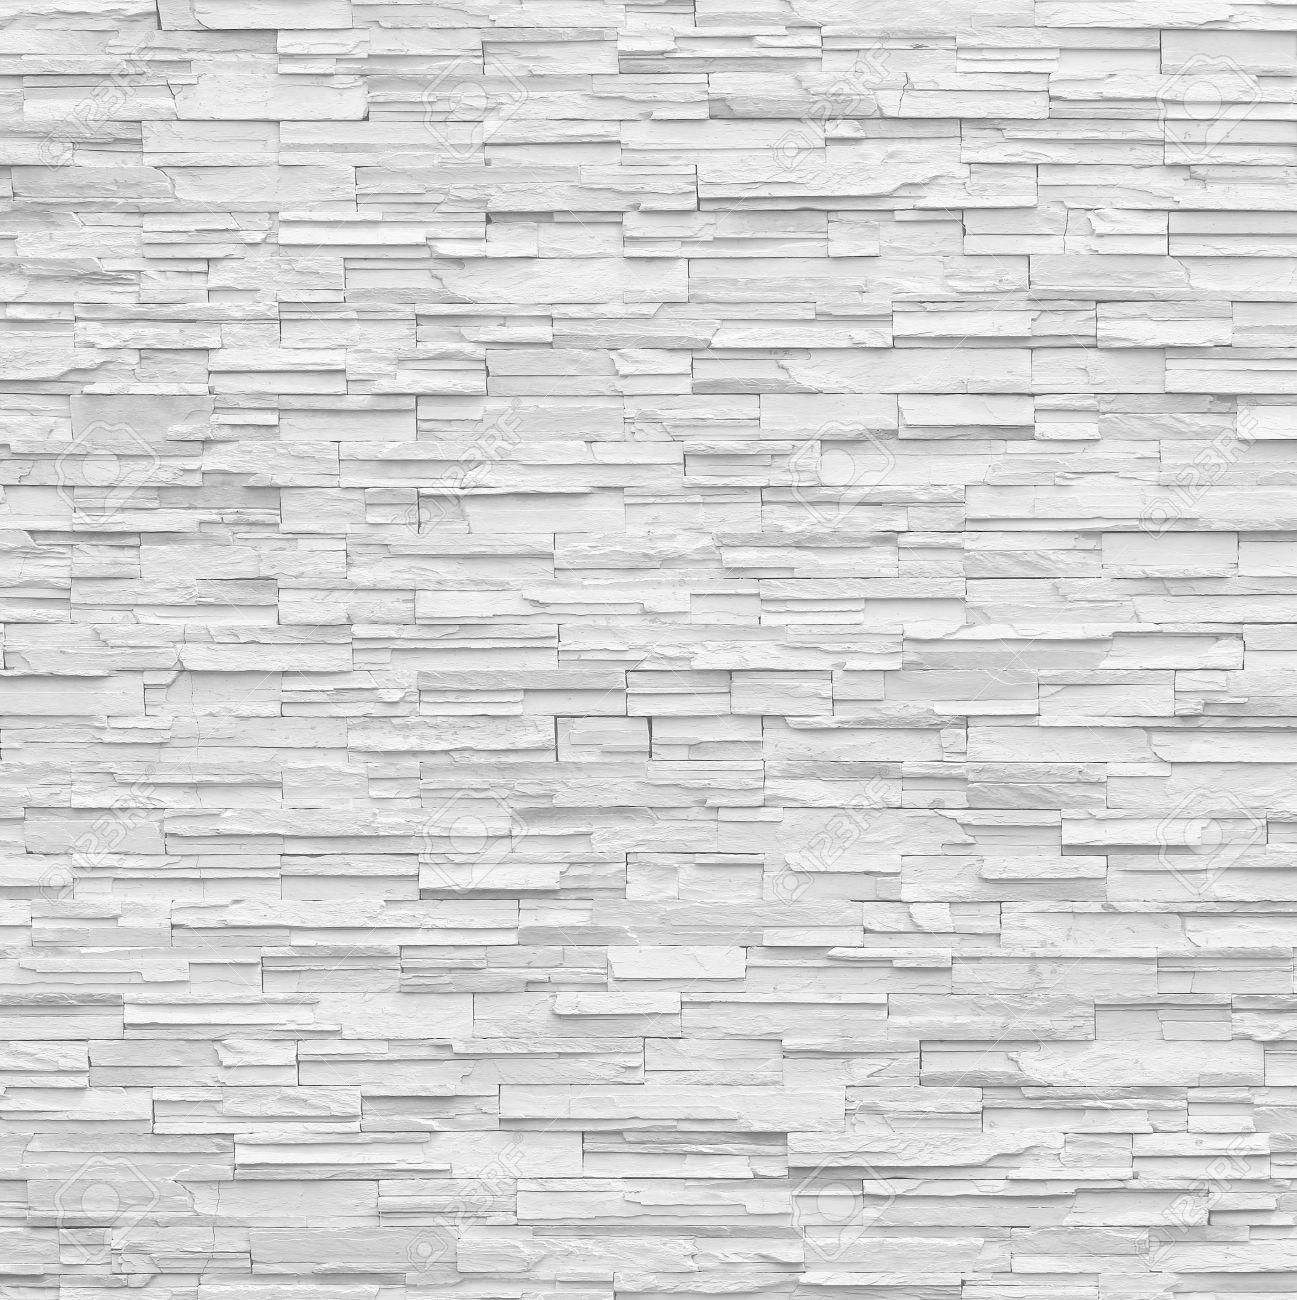 pattern of decorative slate stone white wall surface - 51521311